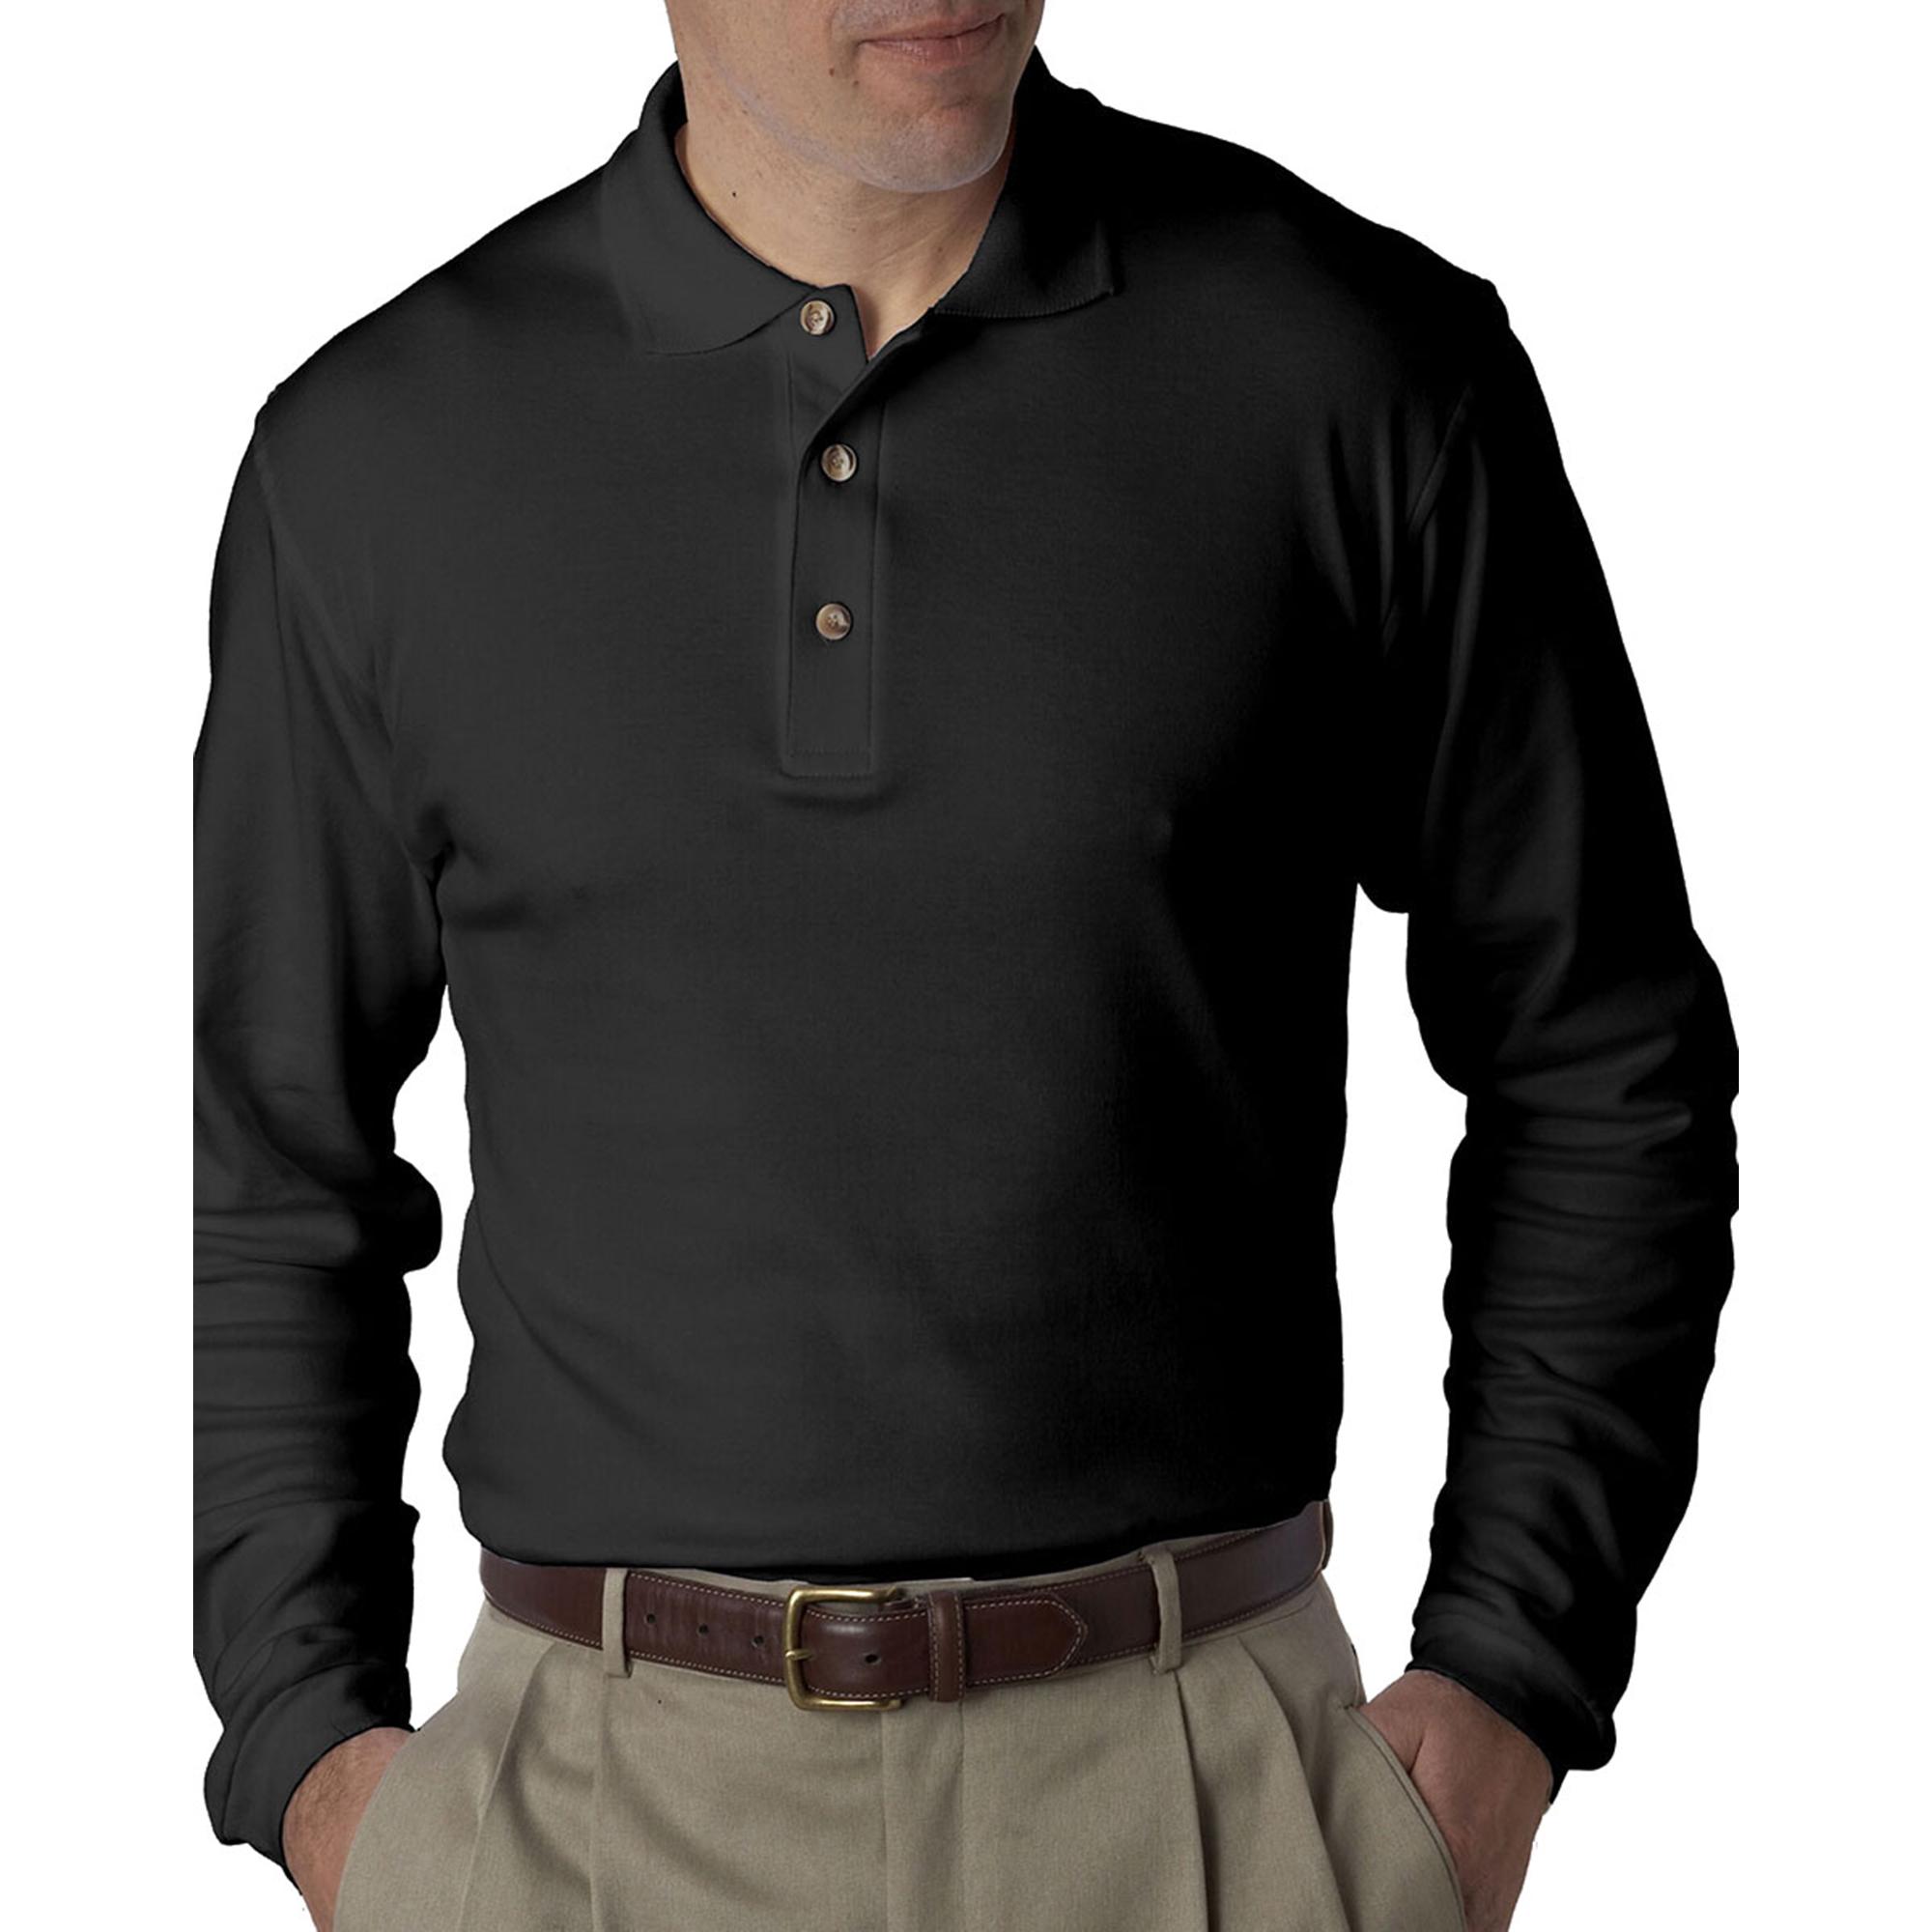 ULTRACLUB 8501 Men's Egyptian Interlock Long Sleeve Polo Shirt at Sears.com